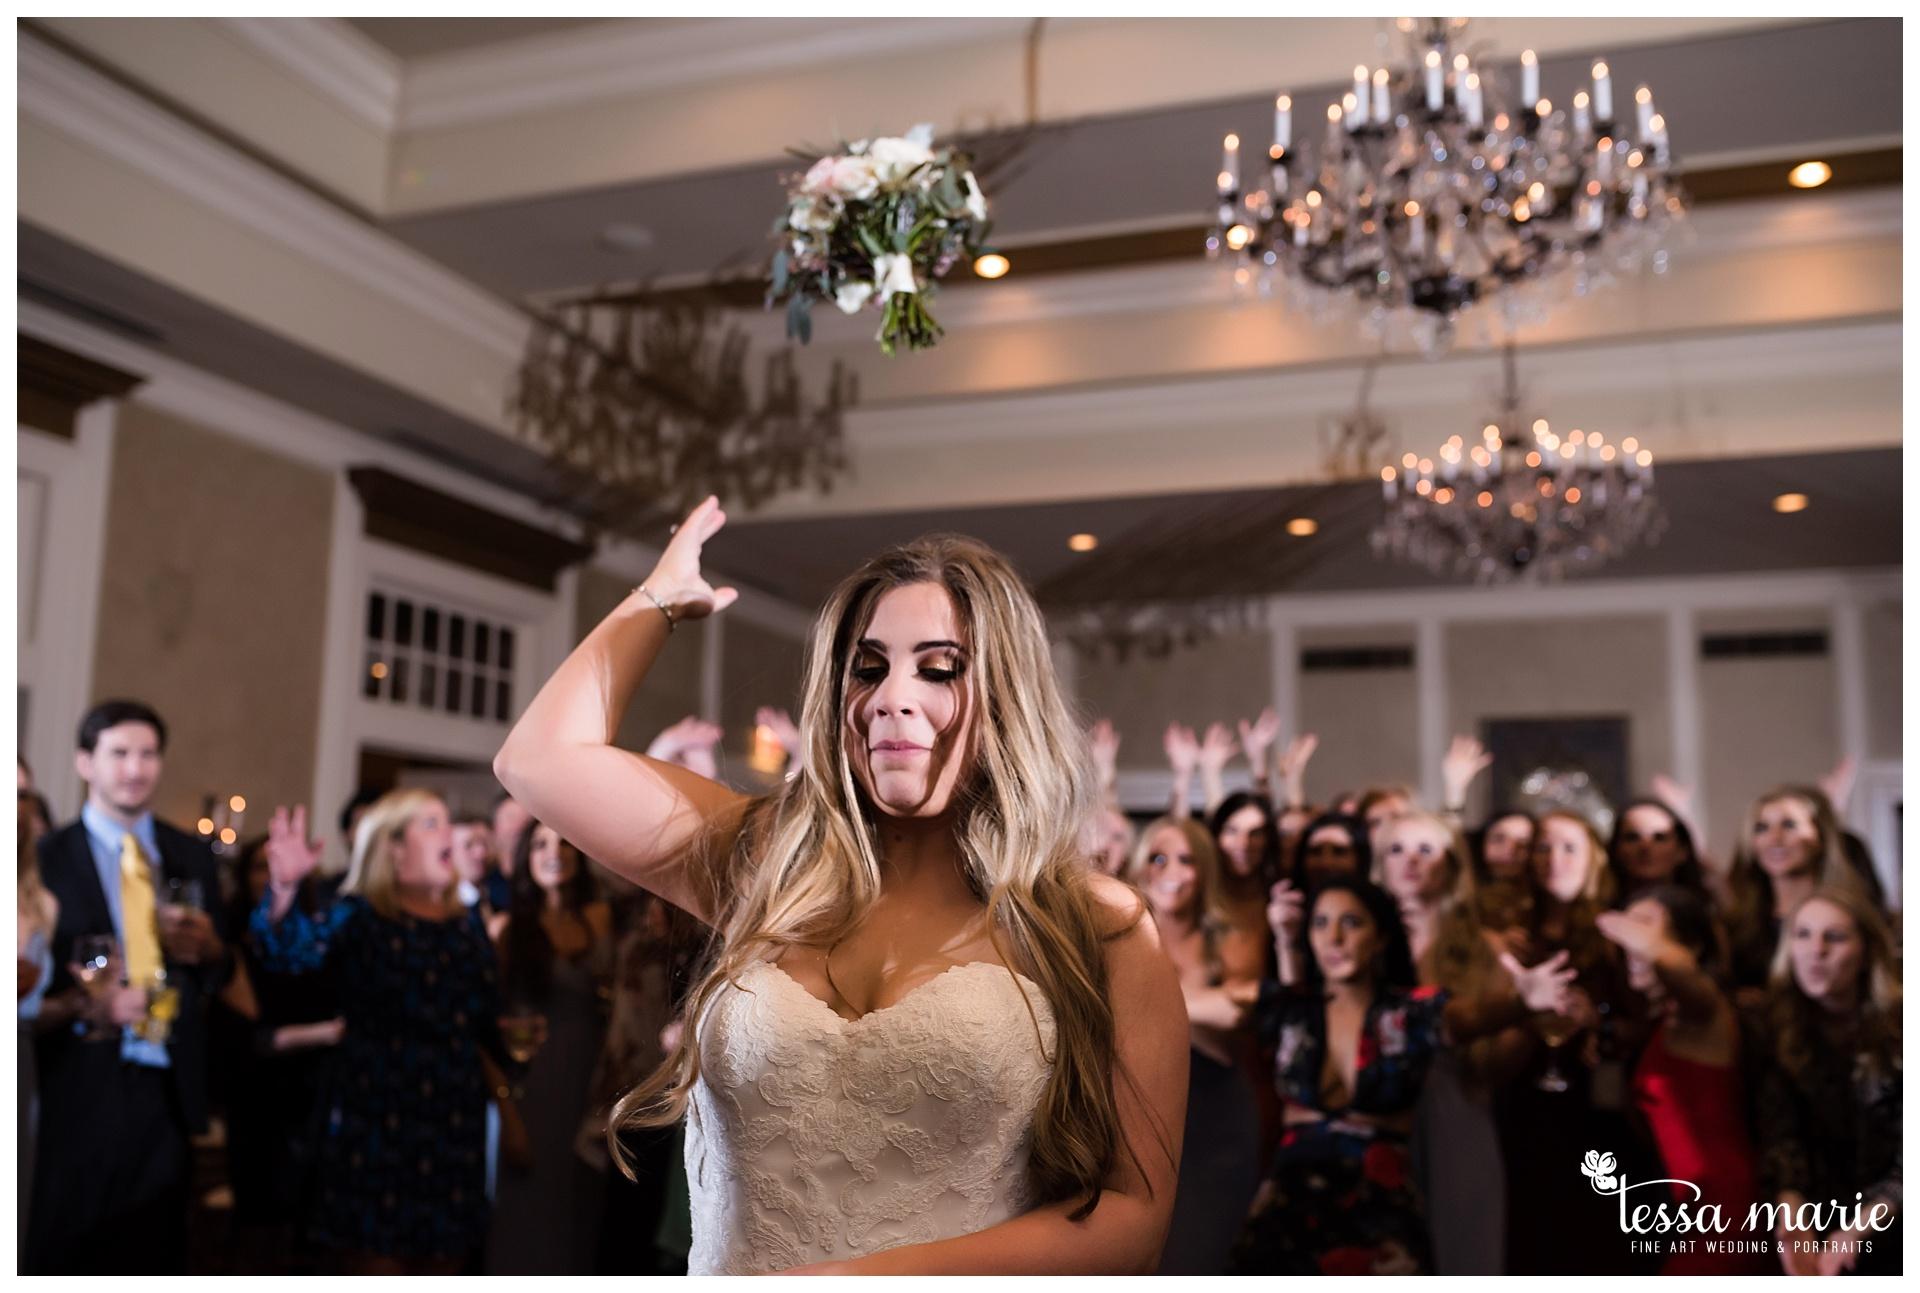 tessa_marie_weddings_legacy_story_focused_wedding_pictures_atlanta_wedding_photographer_0160